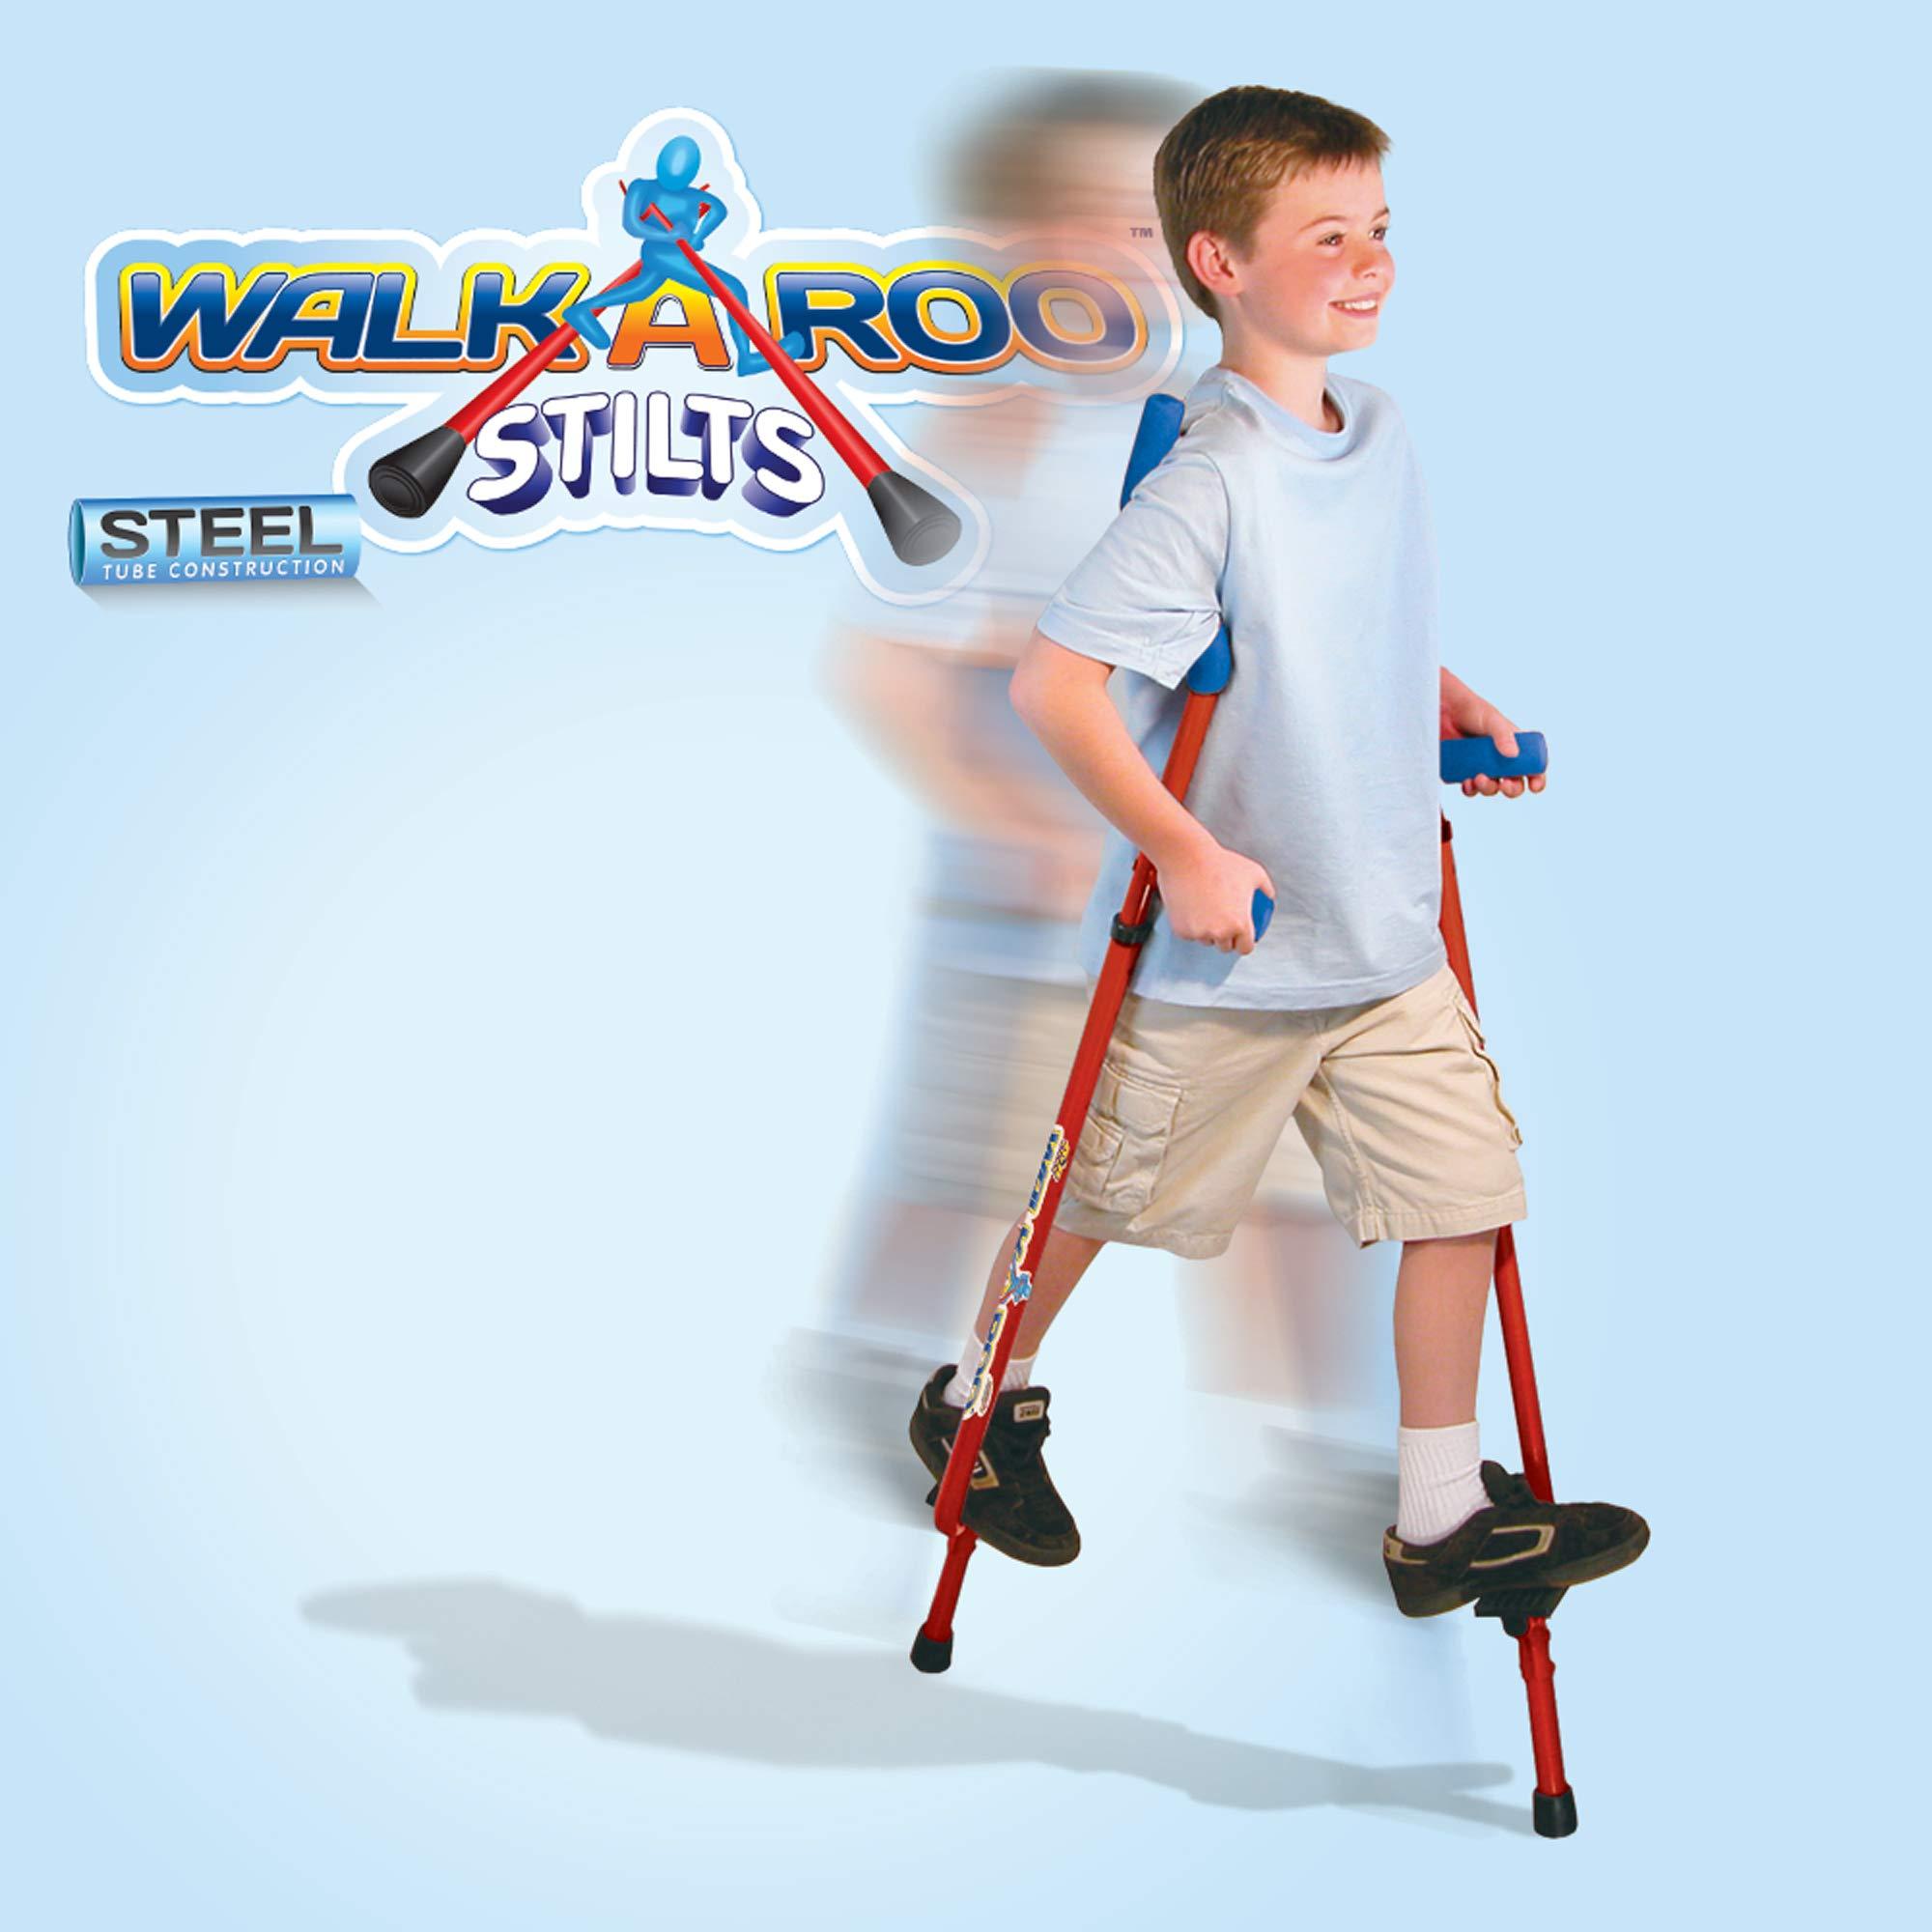 Geospace Original Walkaroo Stilts by Air Kicks (Steel) with Ergonomic Design for Easy Balance Walking (Red) by Geospace